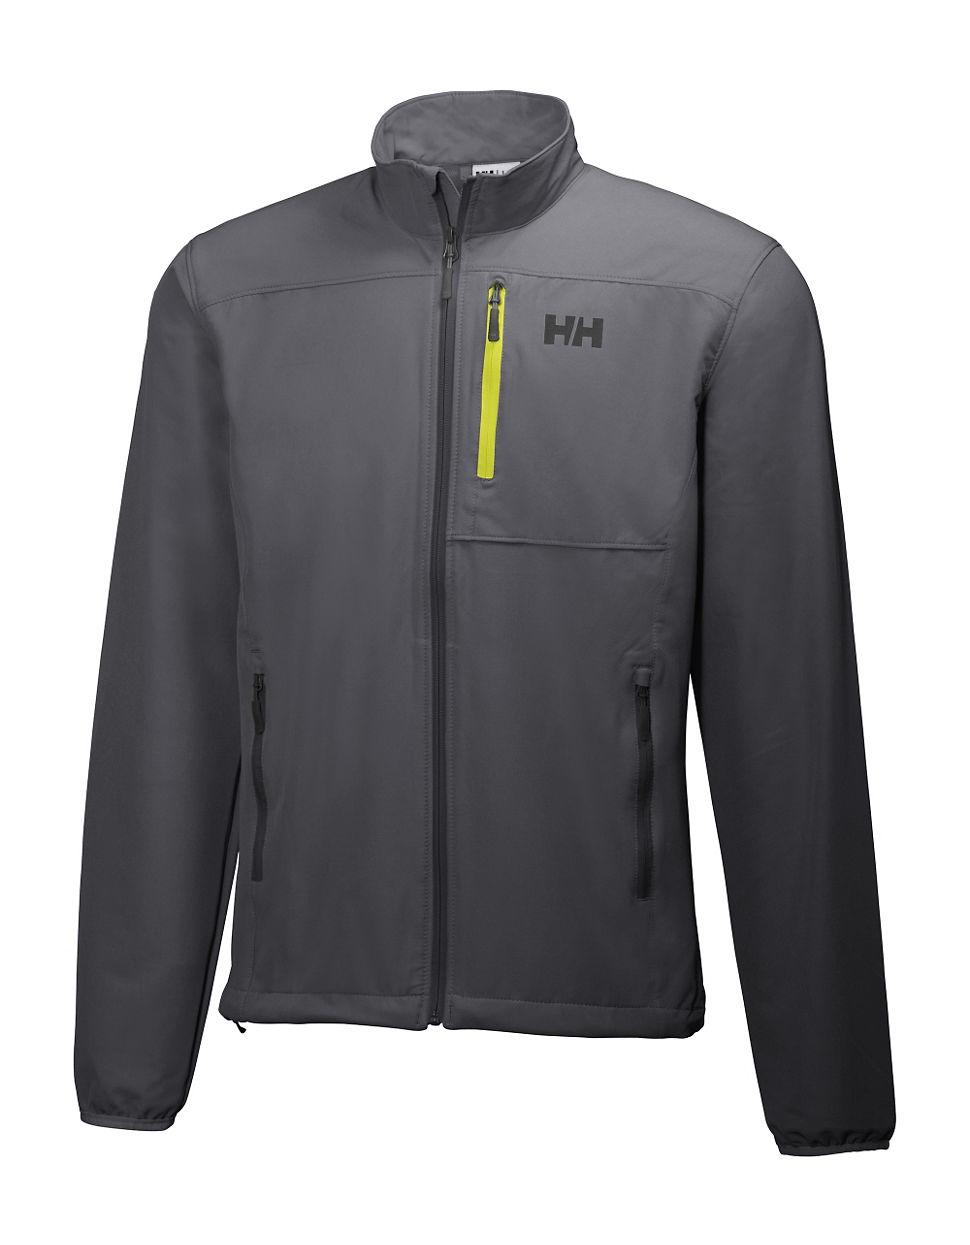 helly hansen paramount speedlight softshell jacket in black for men lyst. Black Bedroom Furniture Sets. Home Design Ideas